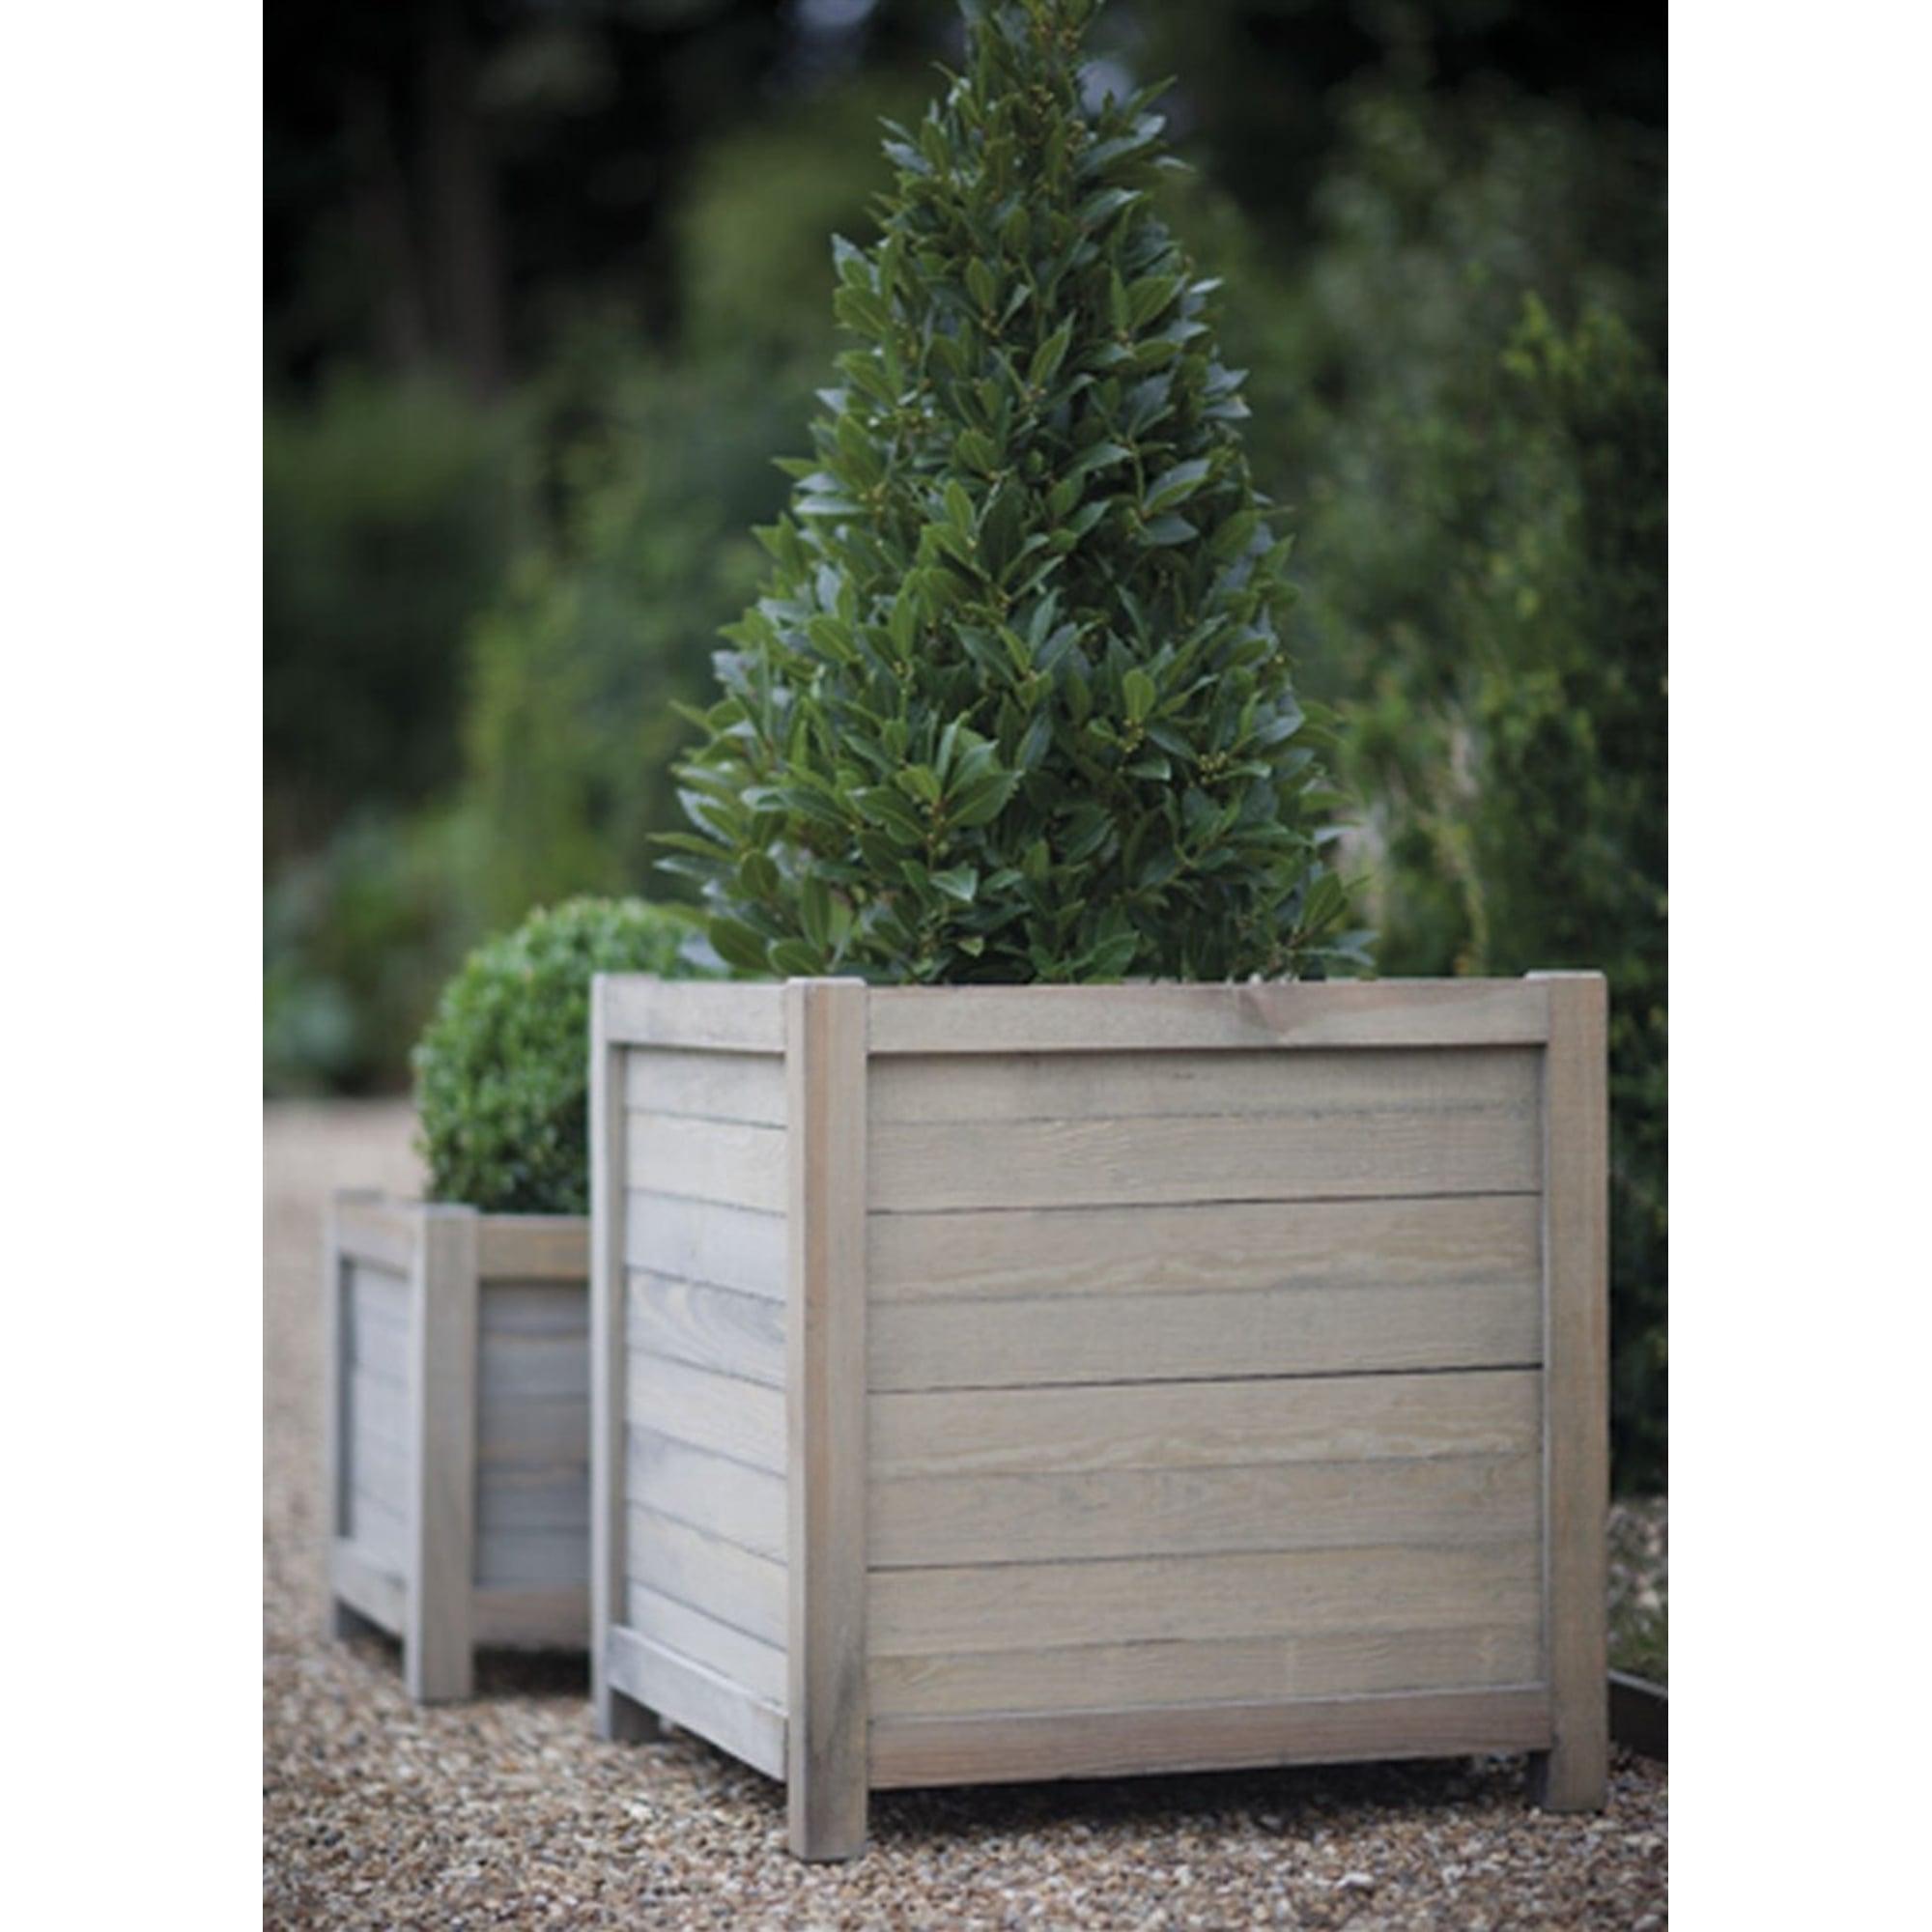 Spruce square planters large